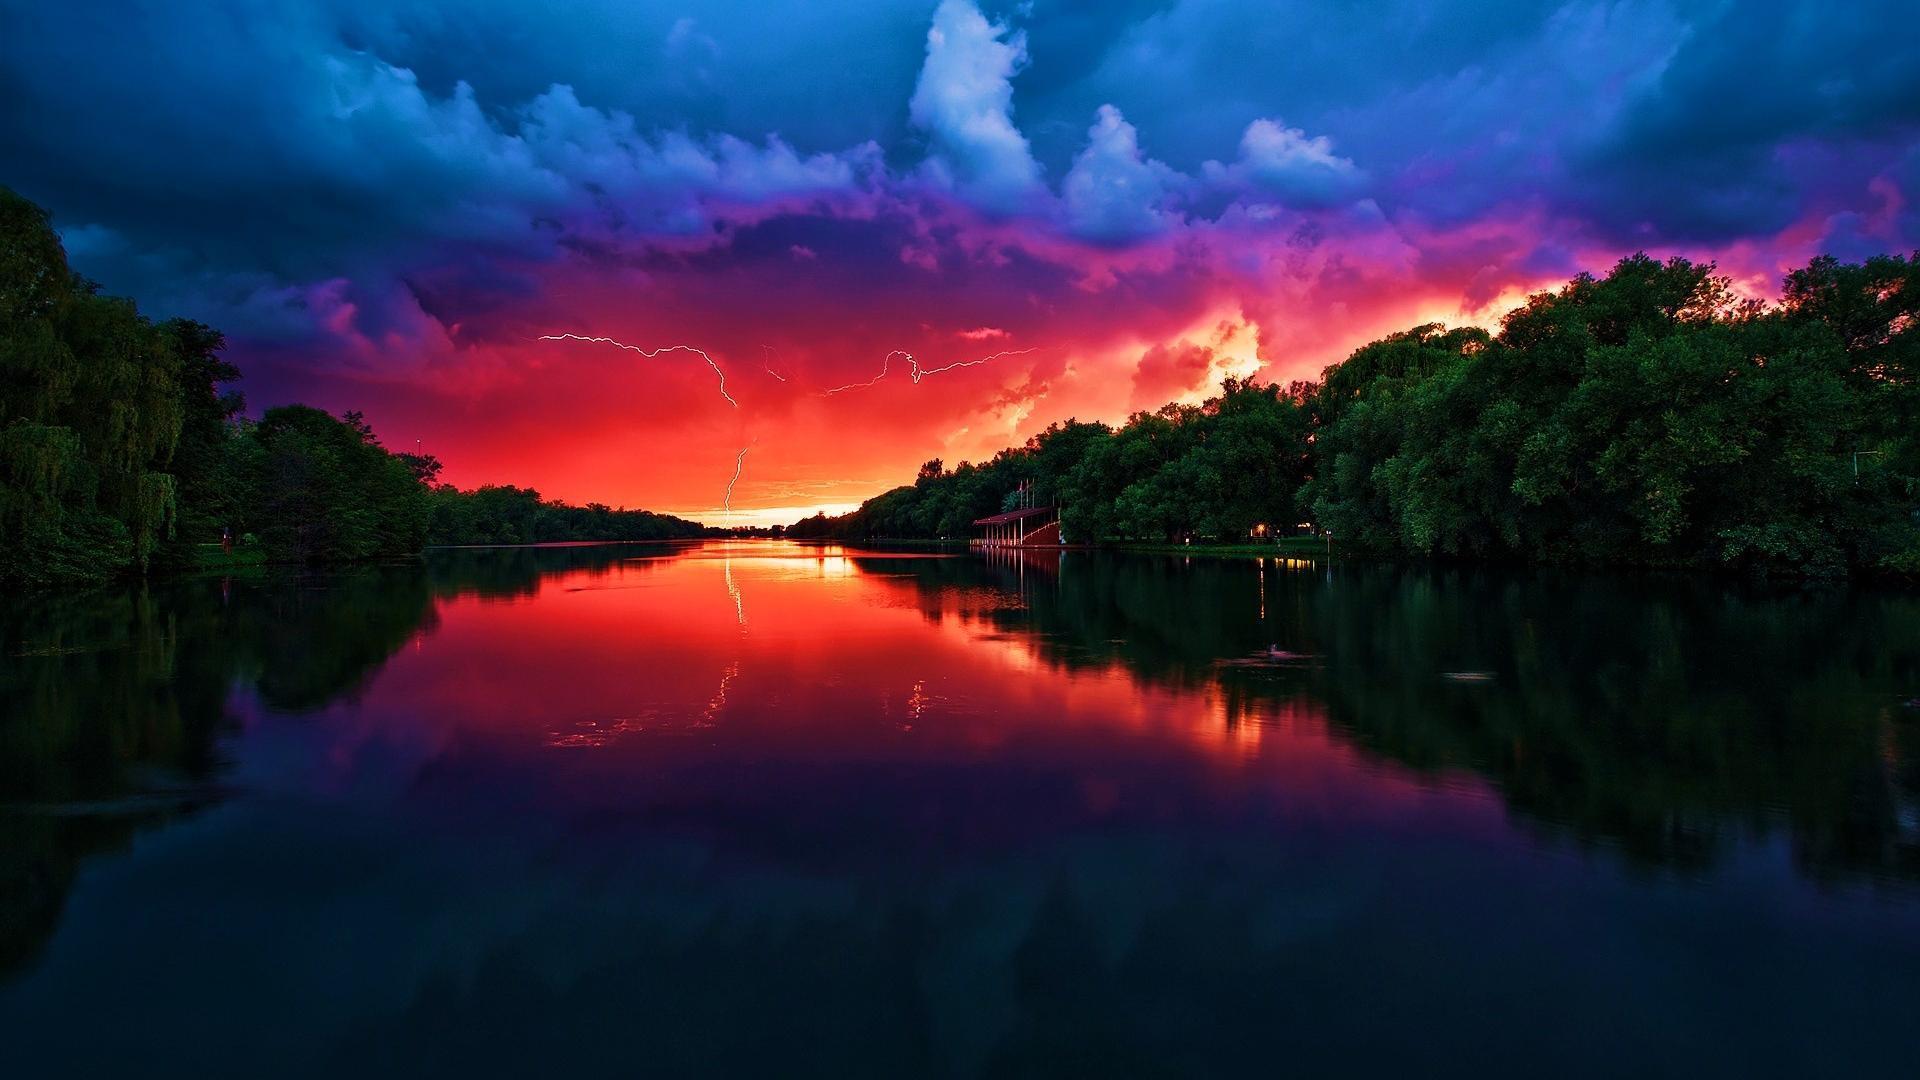 sunset pics wallpaper hd